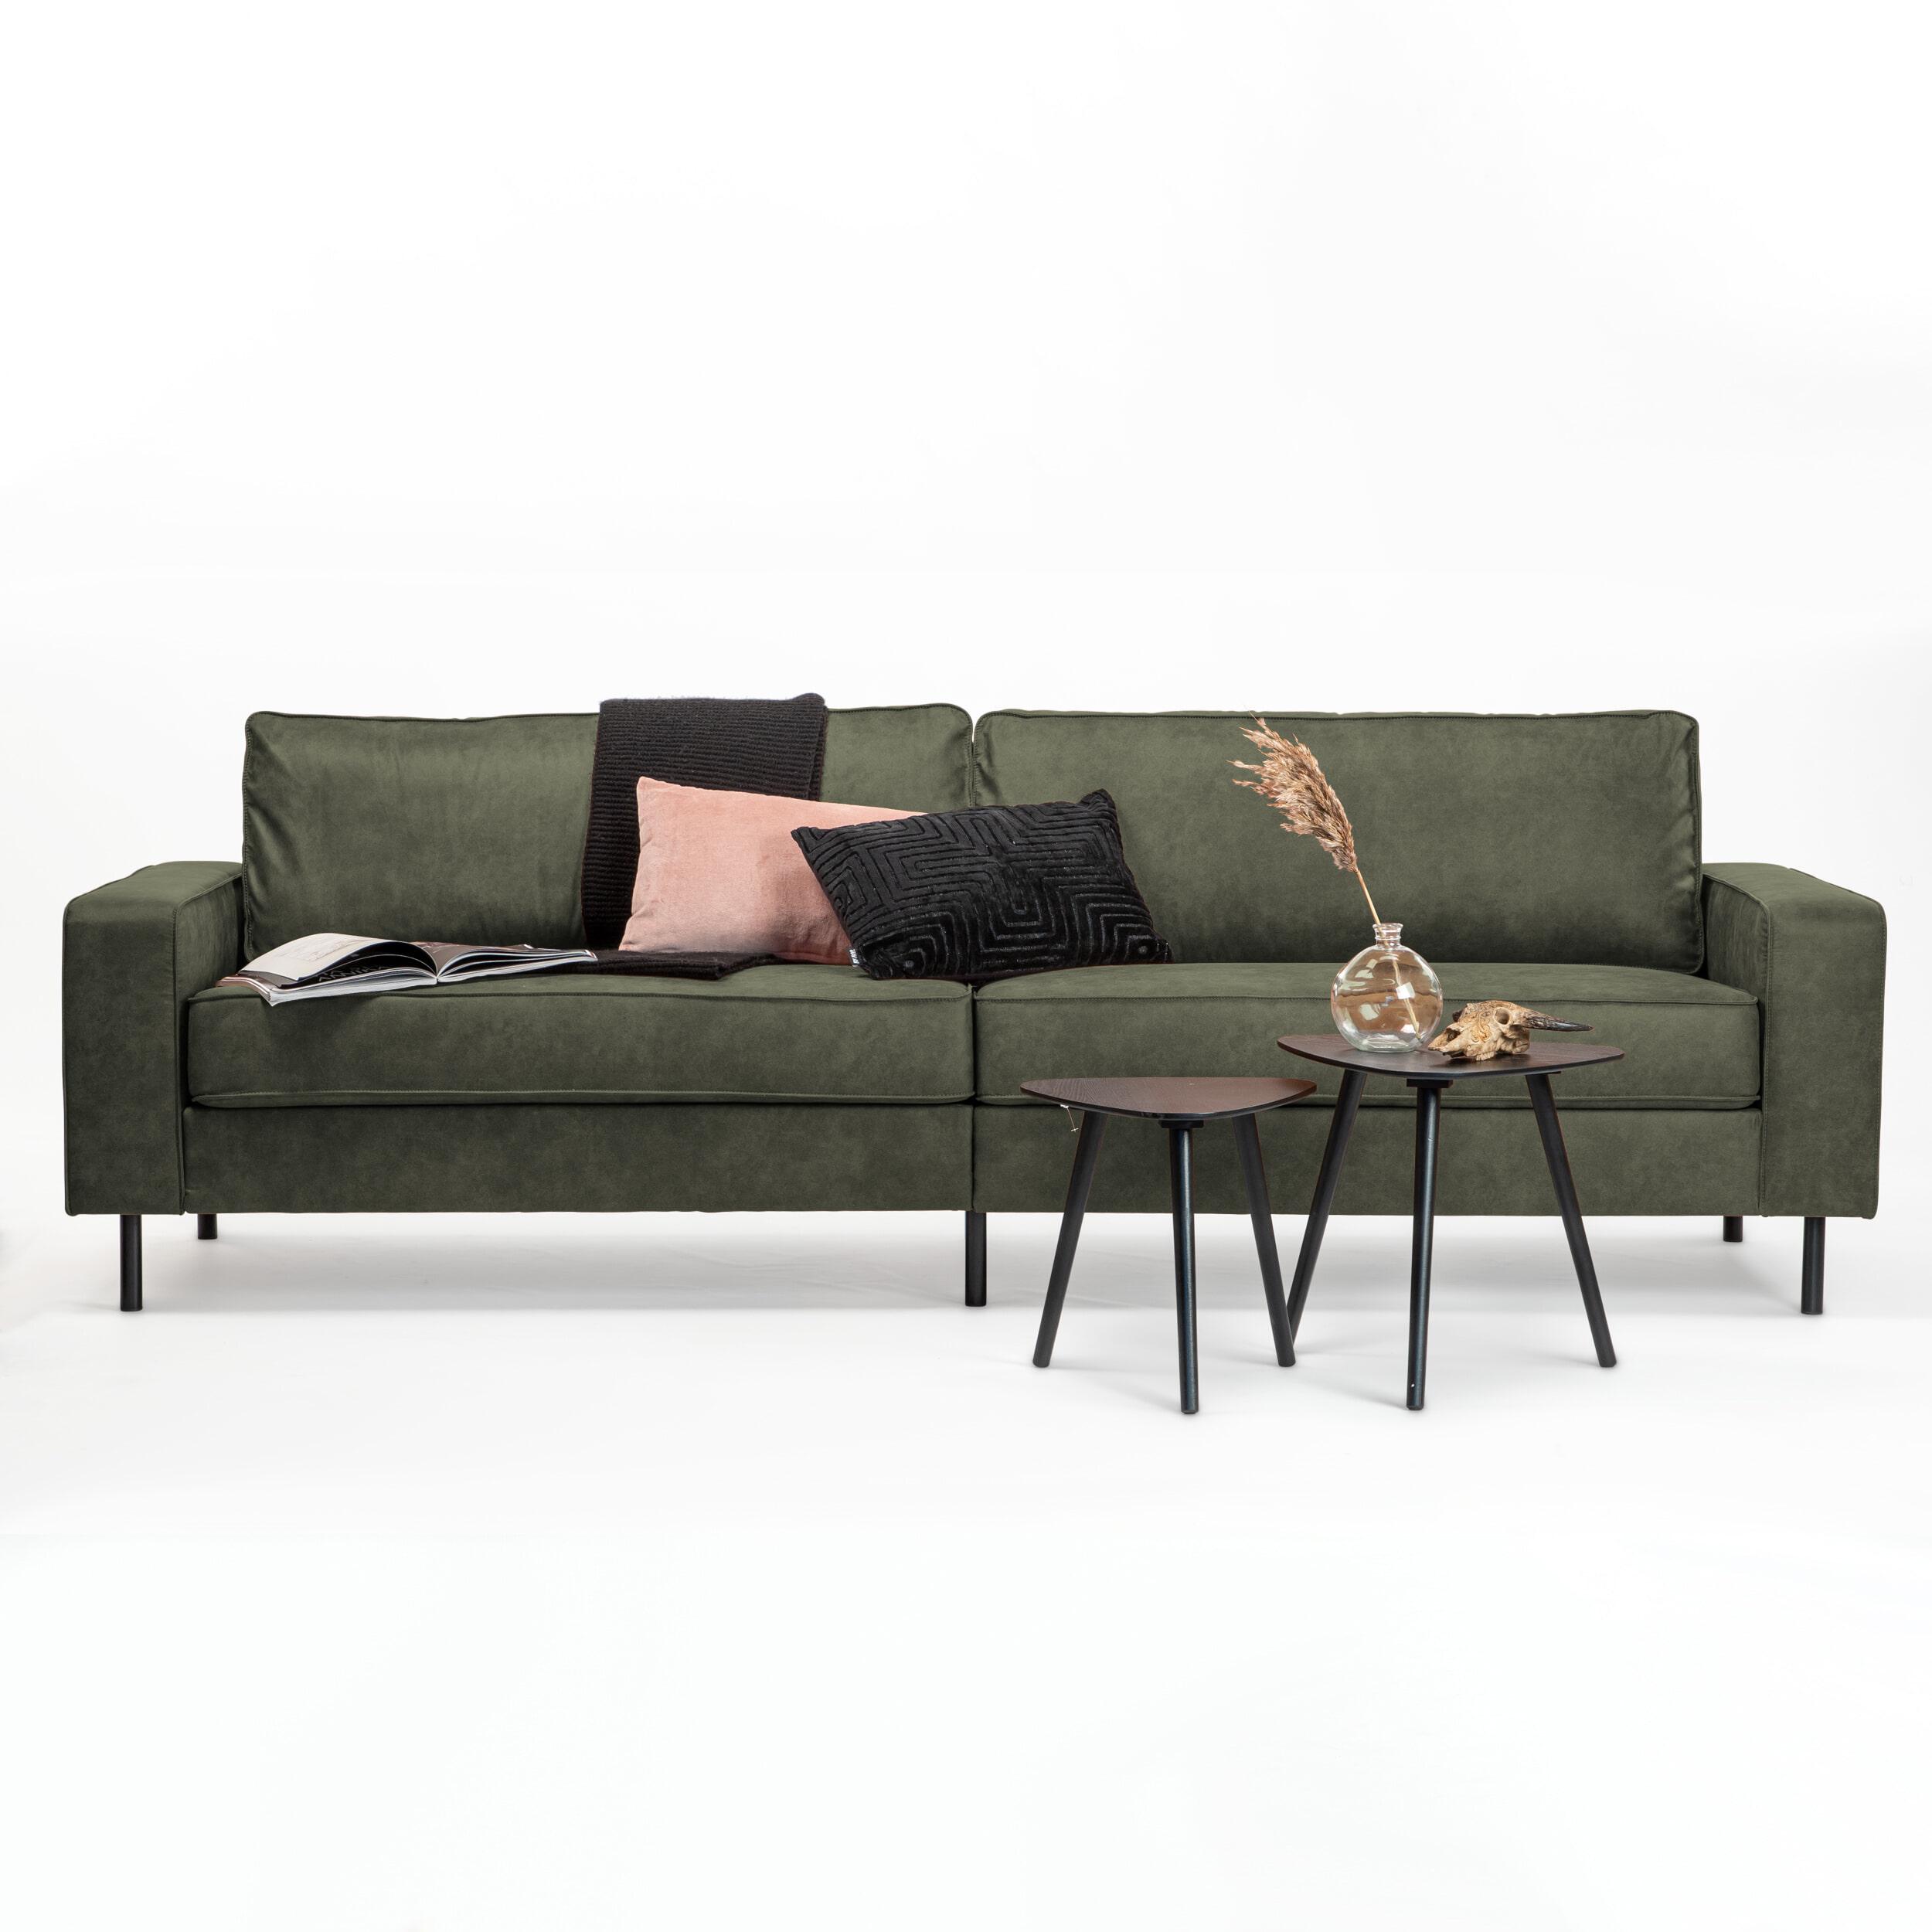 Sohome 3,5-zits Bank 'Maya' Kleur Groen